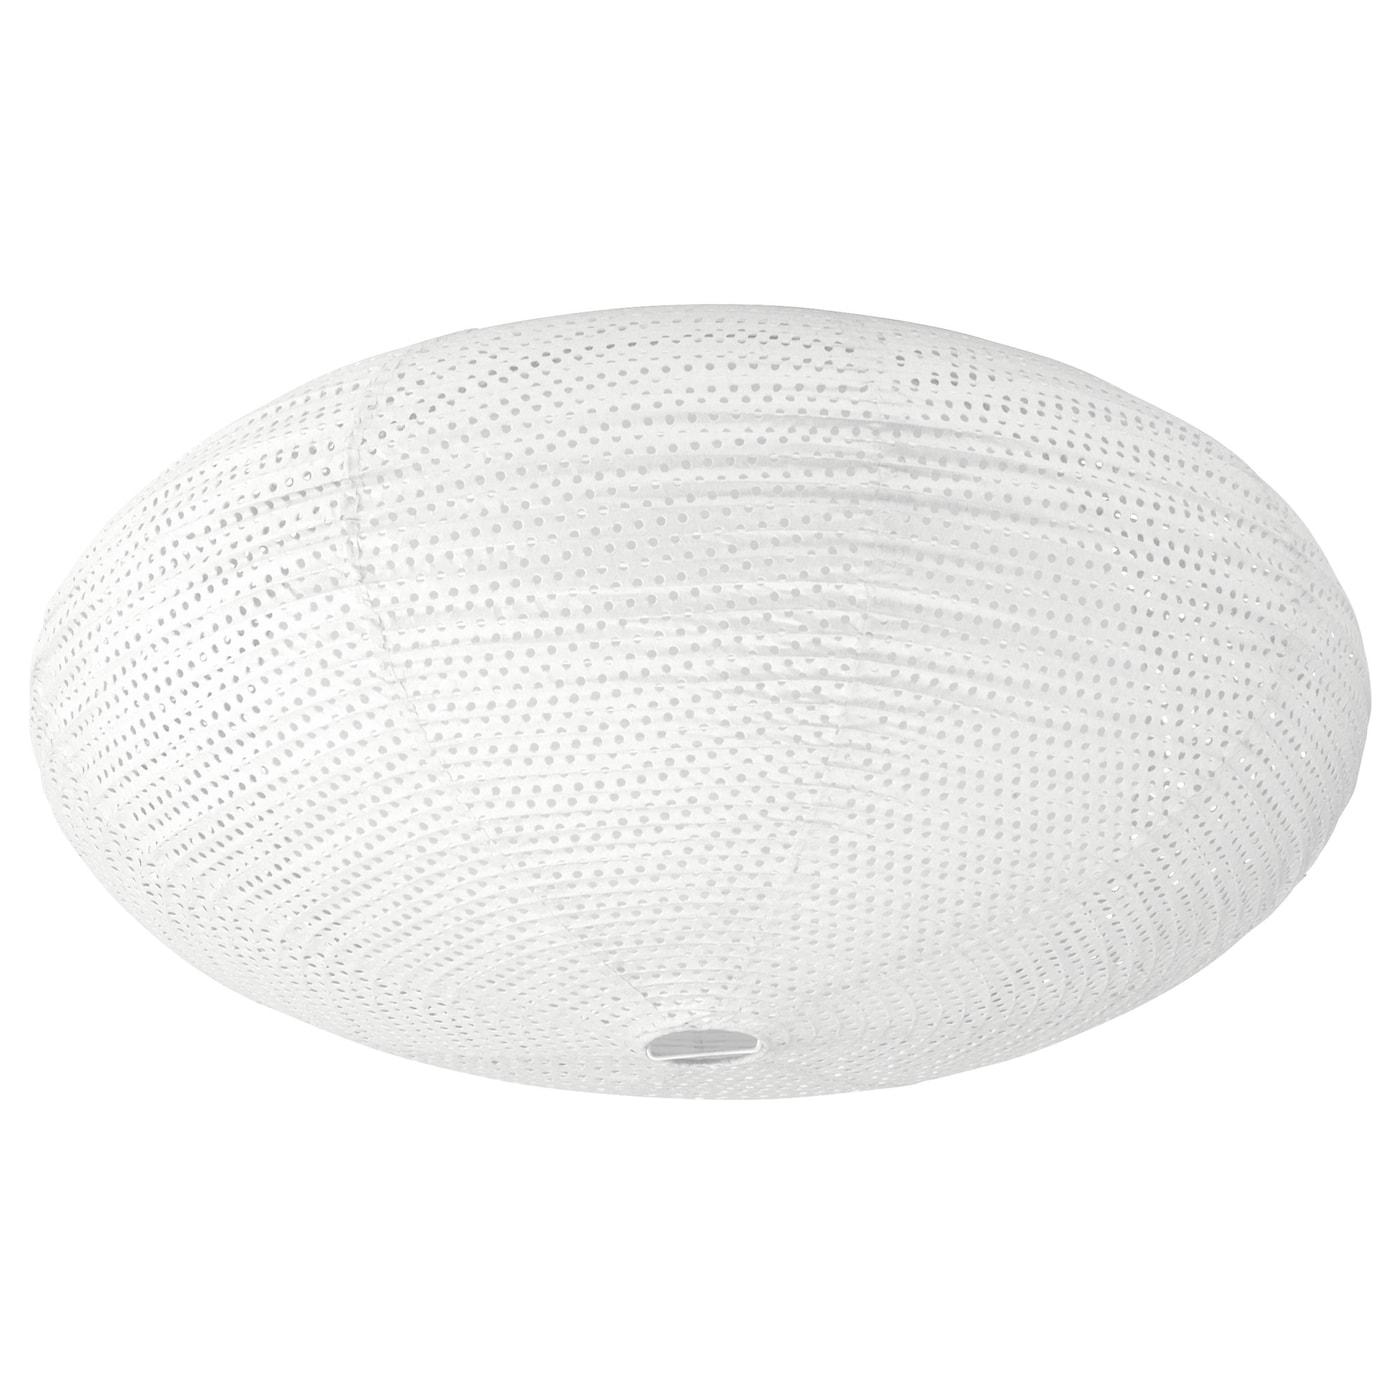 Ikea ceiling lights led ceiling lights ikea sollefte ceiling lamp aloadofball Choice Image